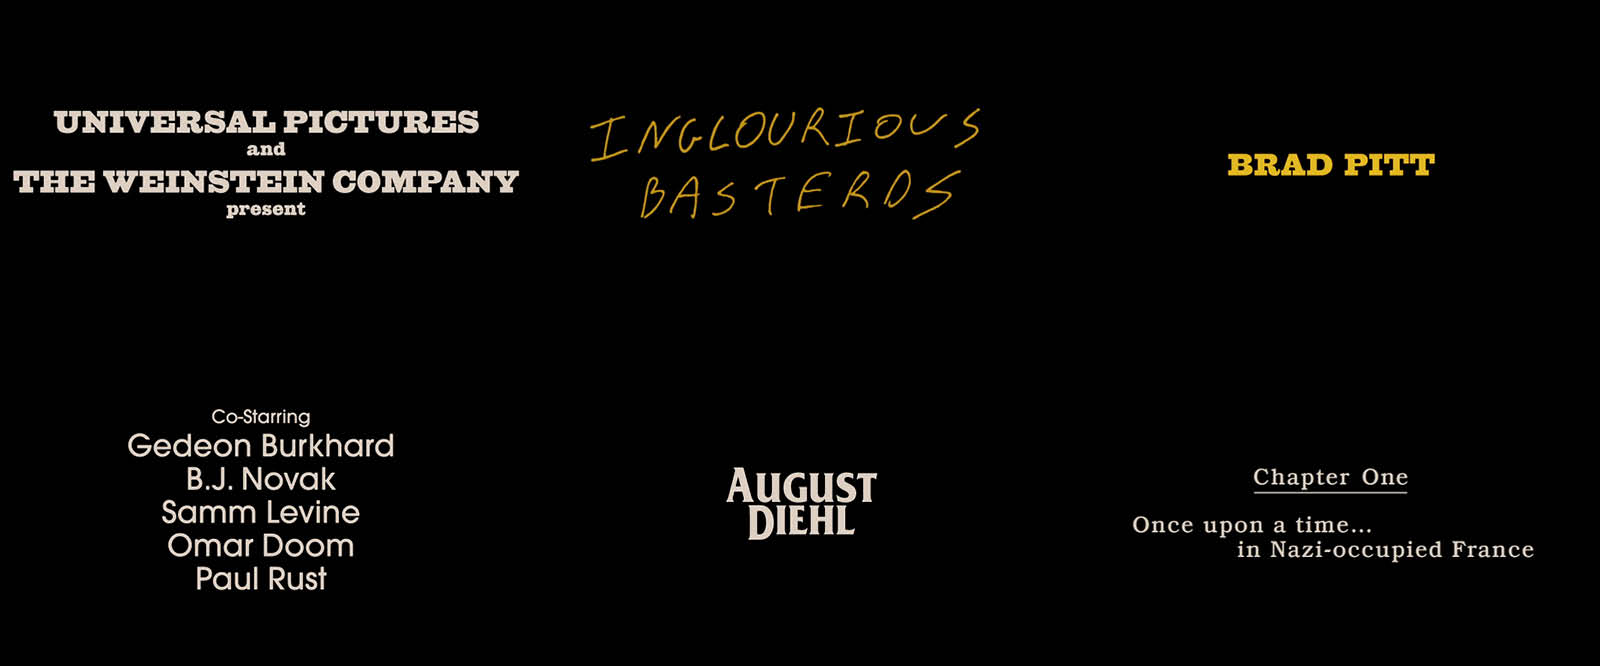 inglourious basterds soundtrack ending a relationship